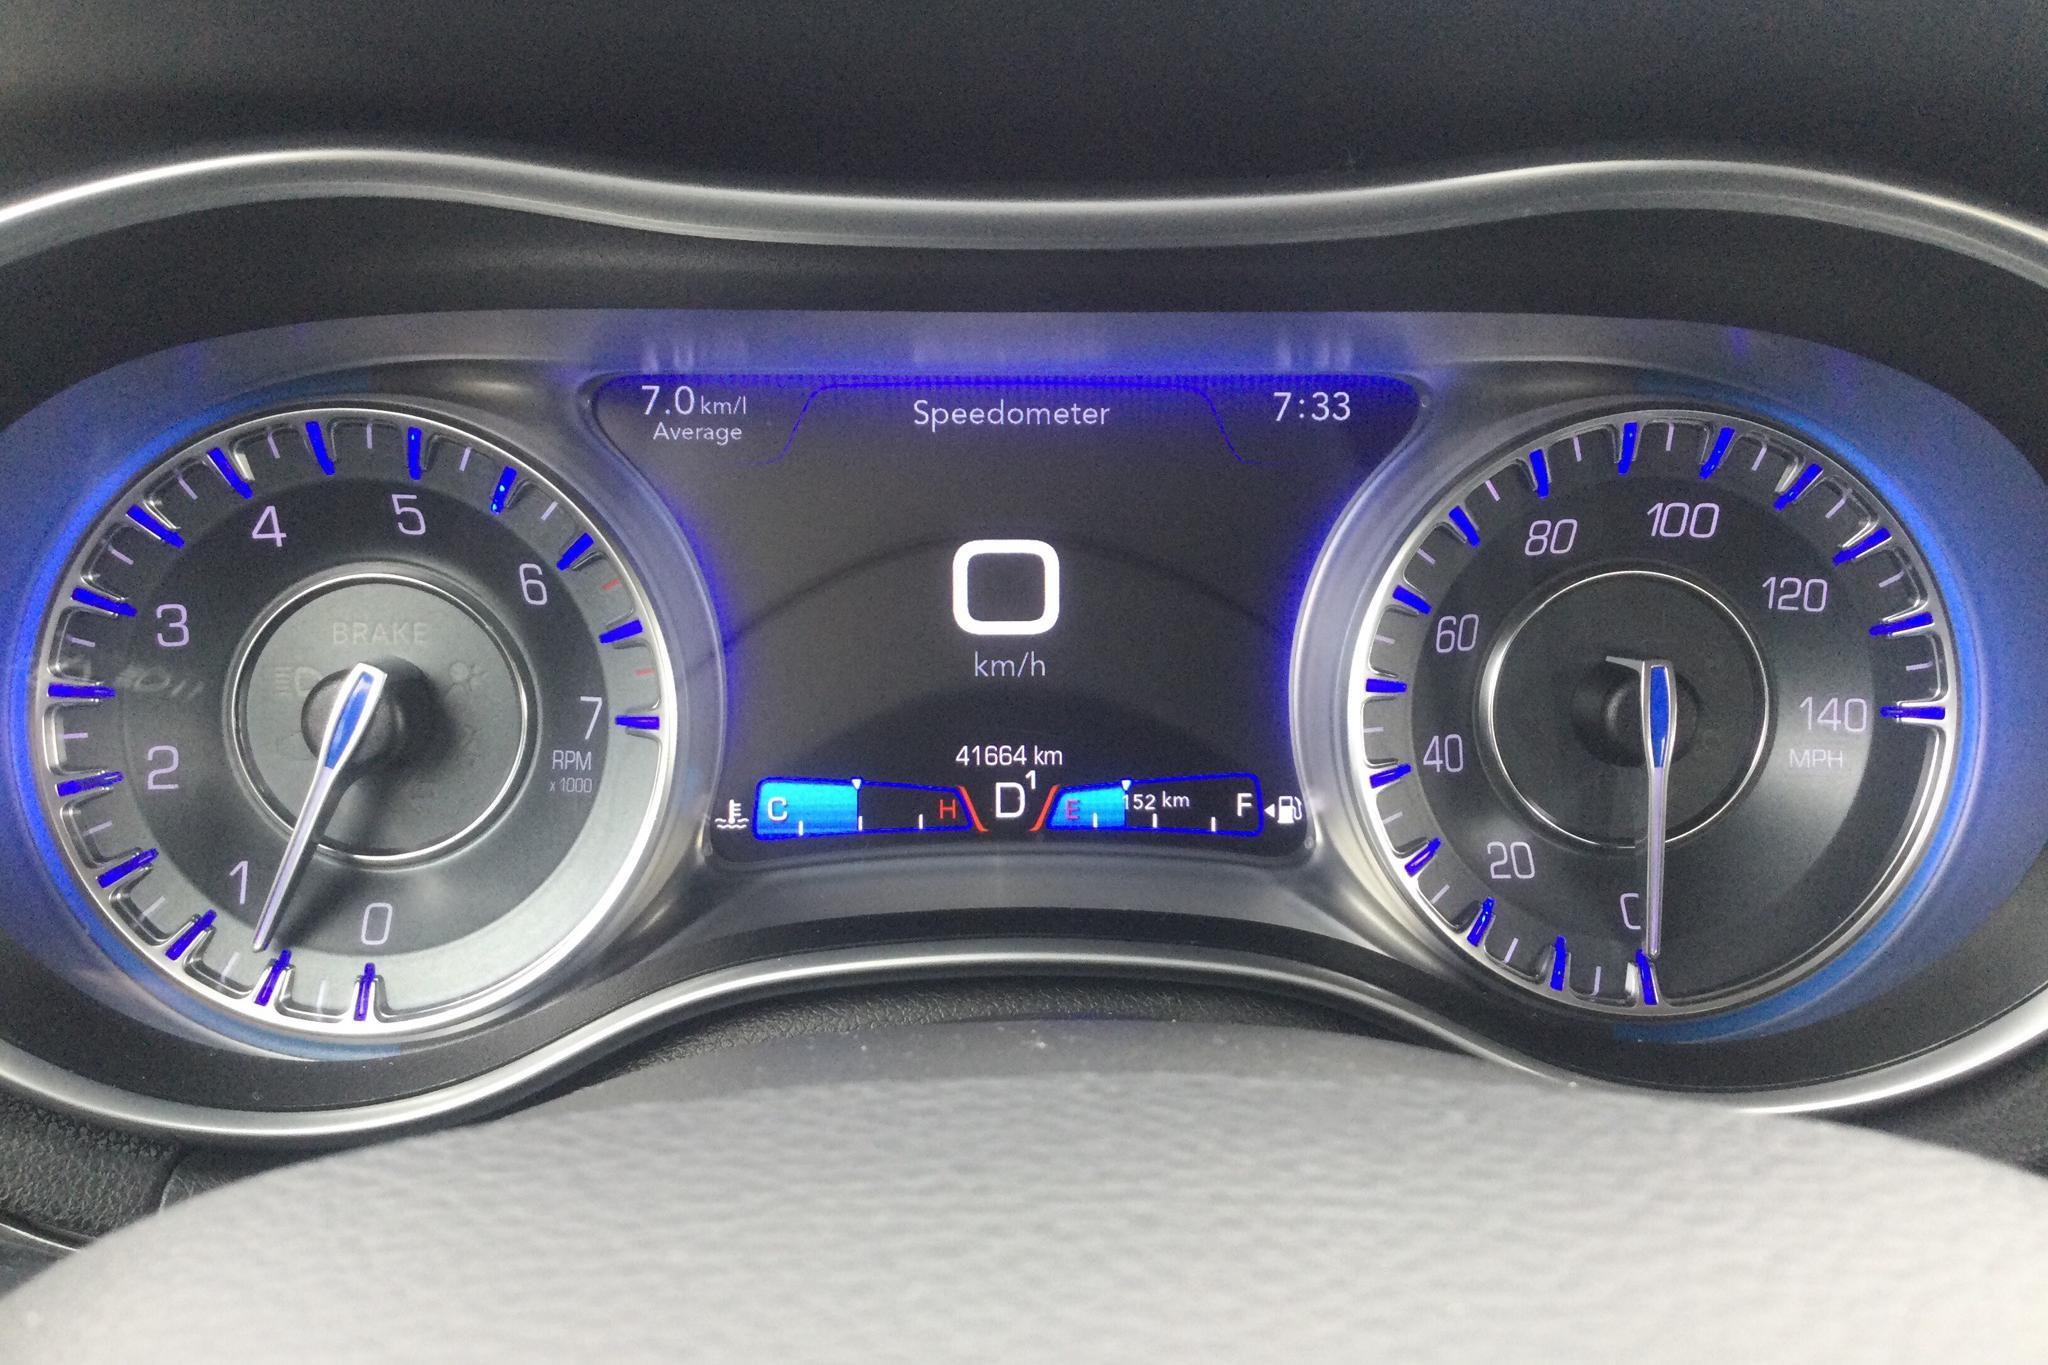 Chrysler 300C 3.6 V6 Pentastar AWD Automatisk, 296hk, 2017 - 41 660 km - Automatic - black - 2017